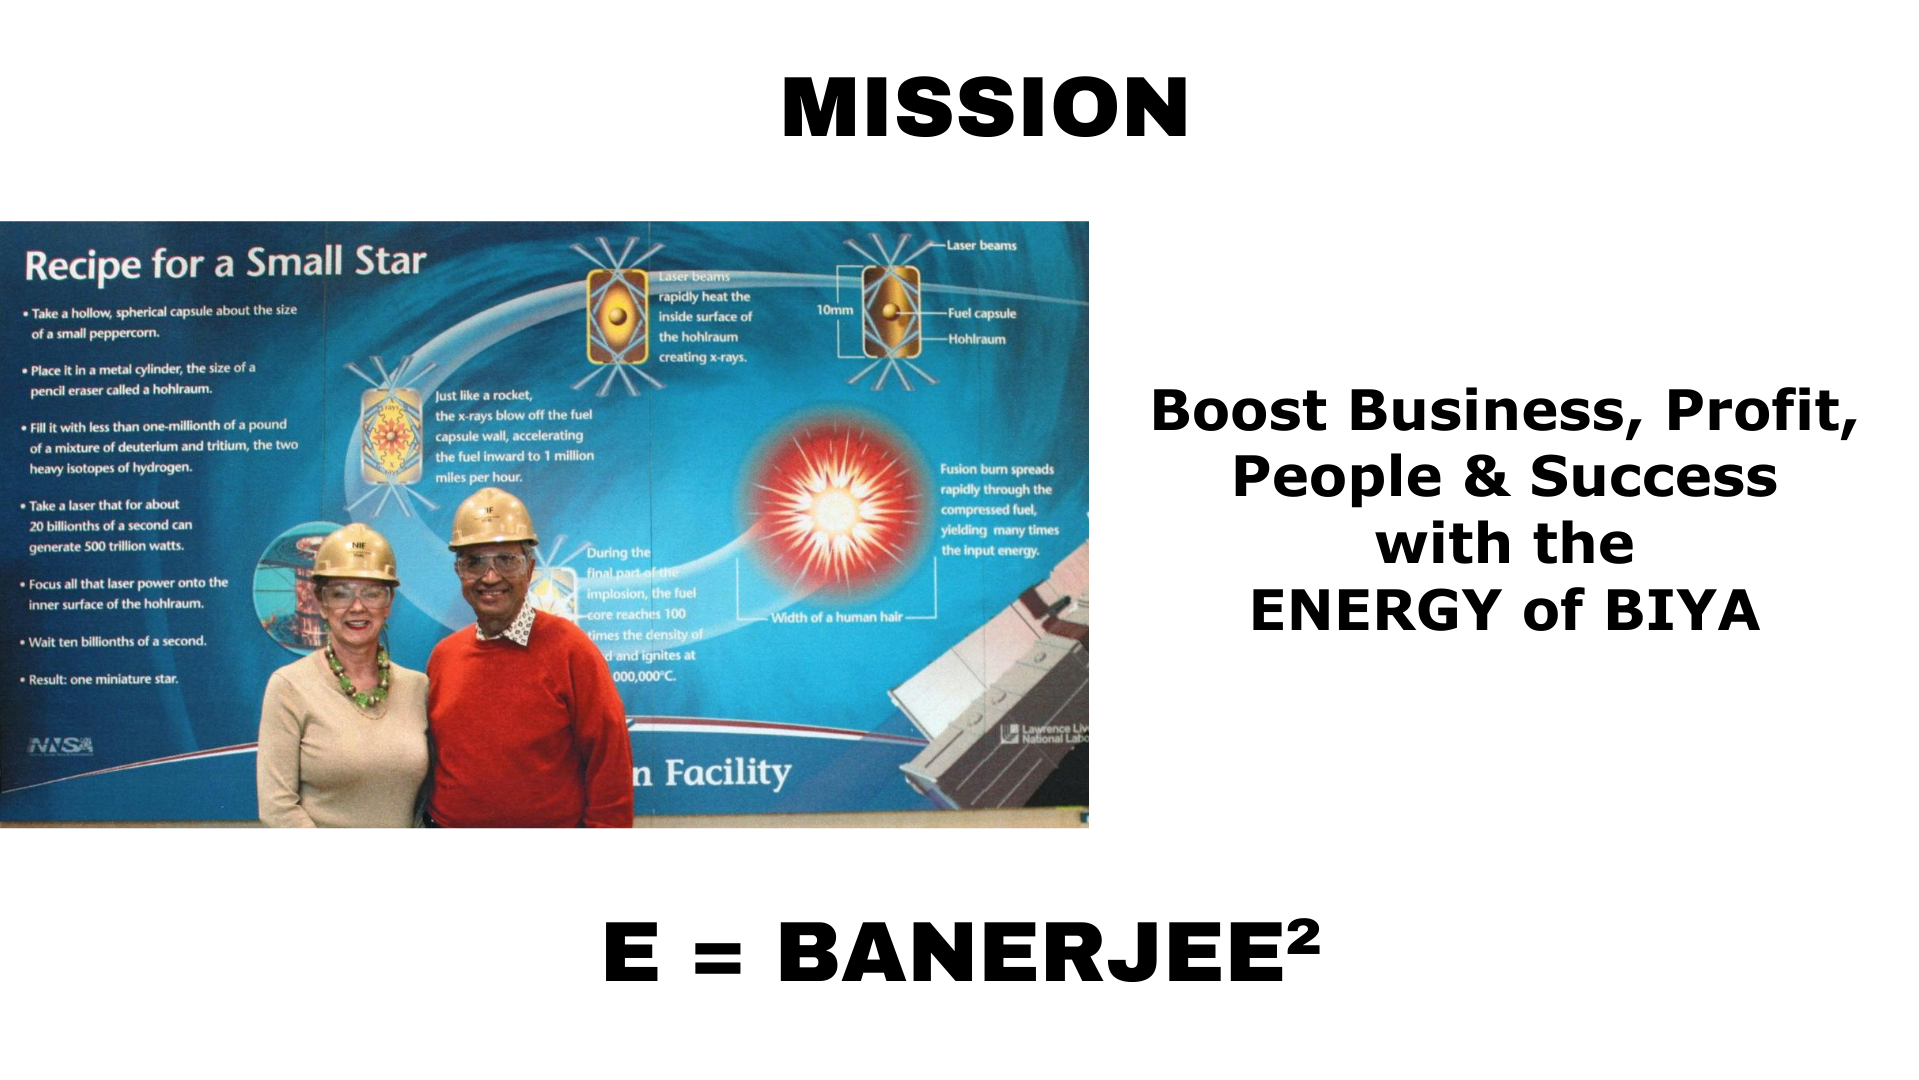 mission statement, team banerjee posing in front of mural depicting laser energy project details